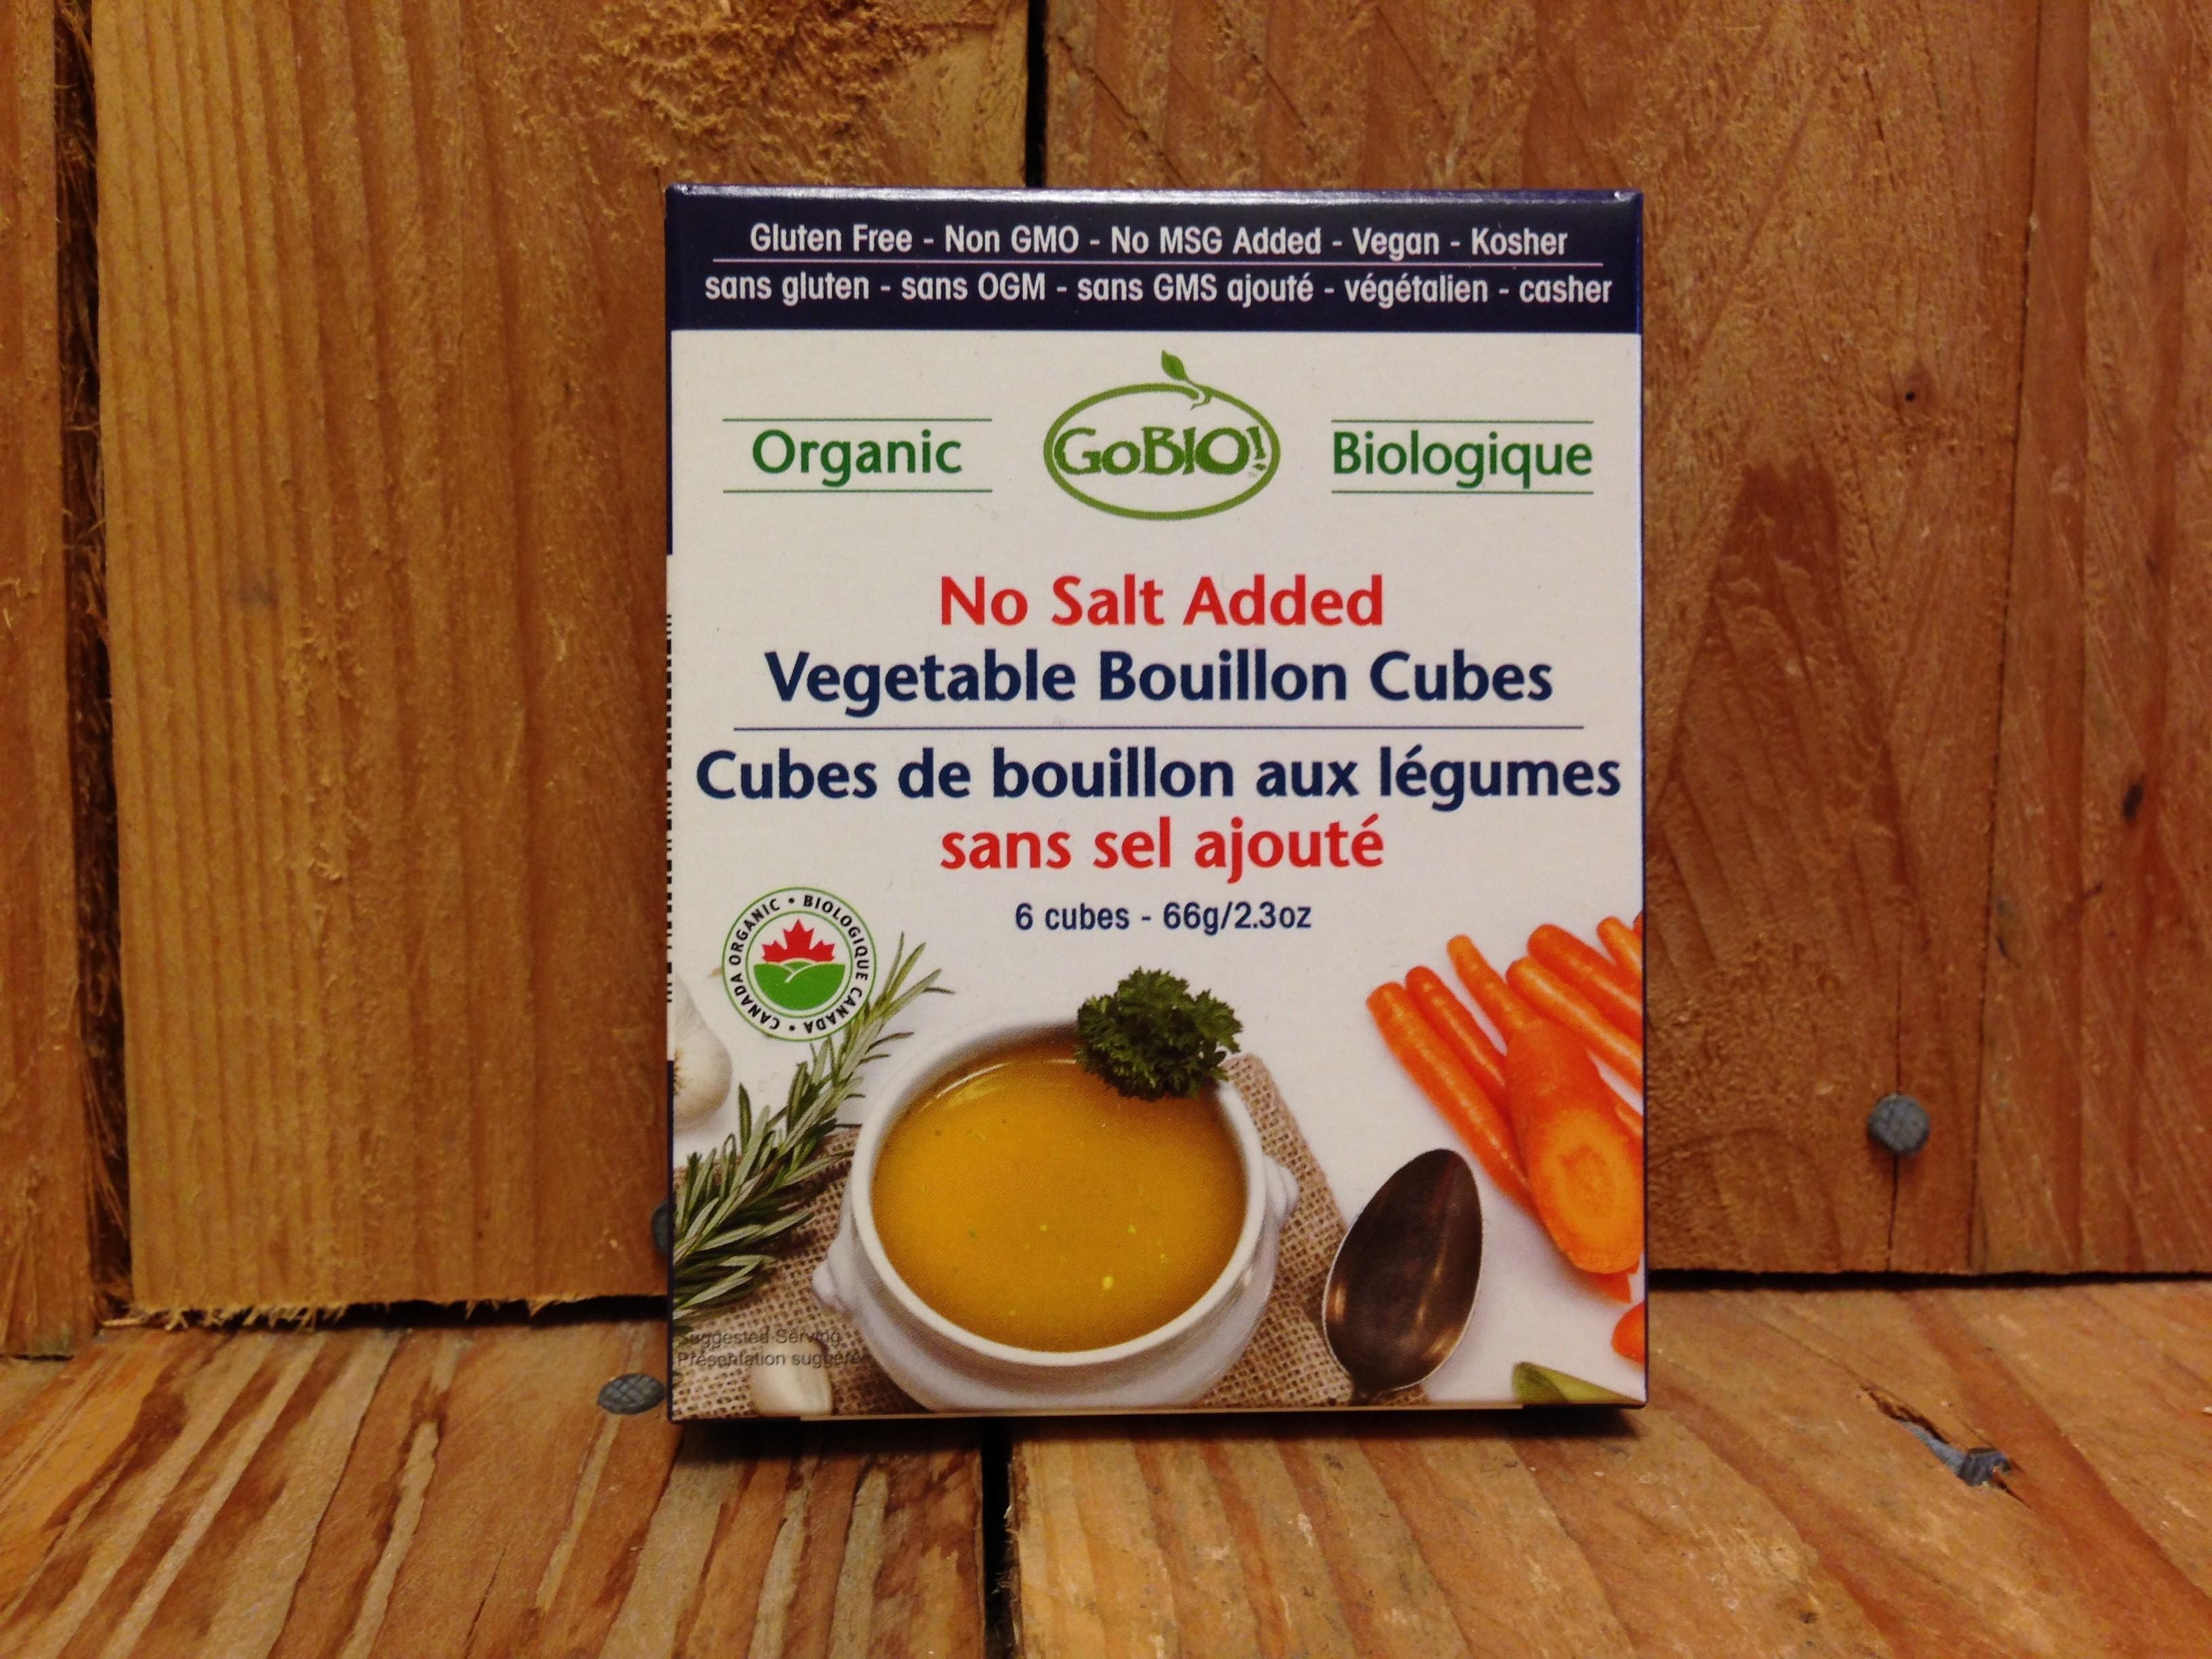 GoBio! – Organic Vegetable Bouillon Cubes – Low Sodium (6 Cubes/60g)